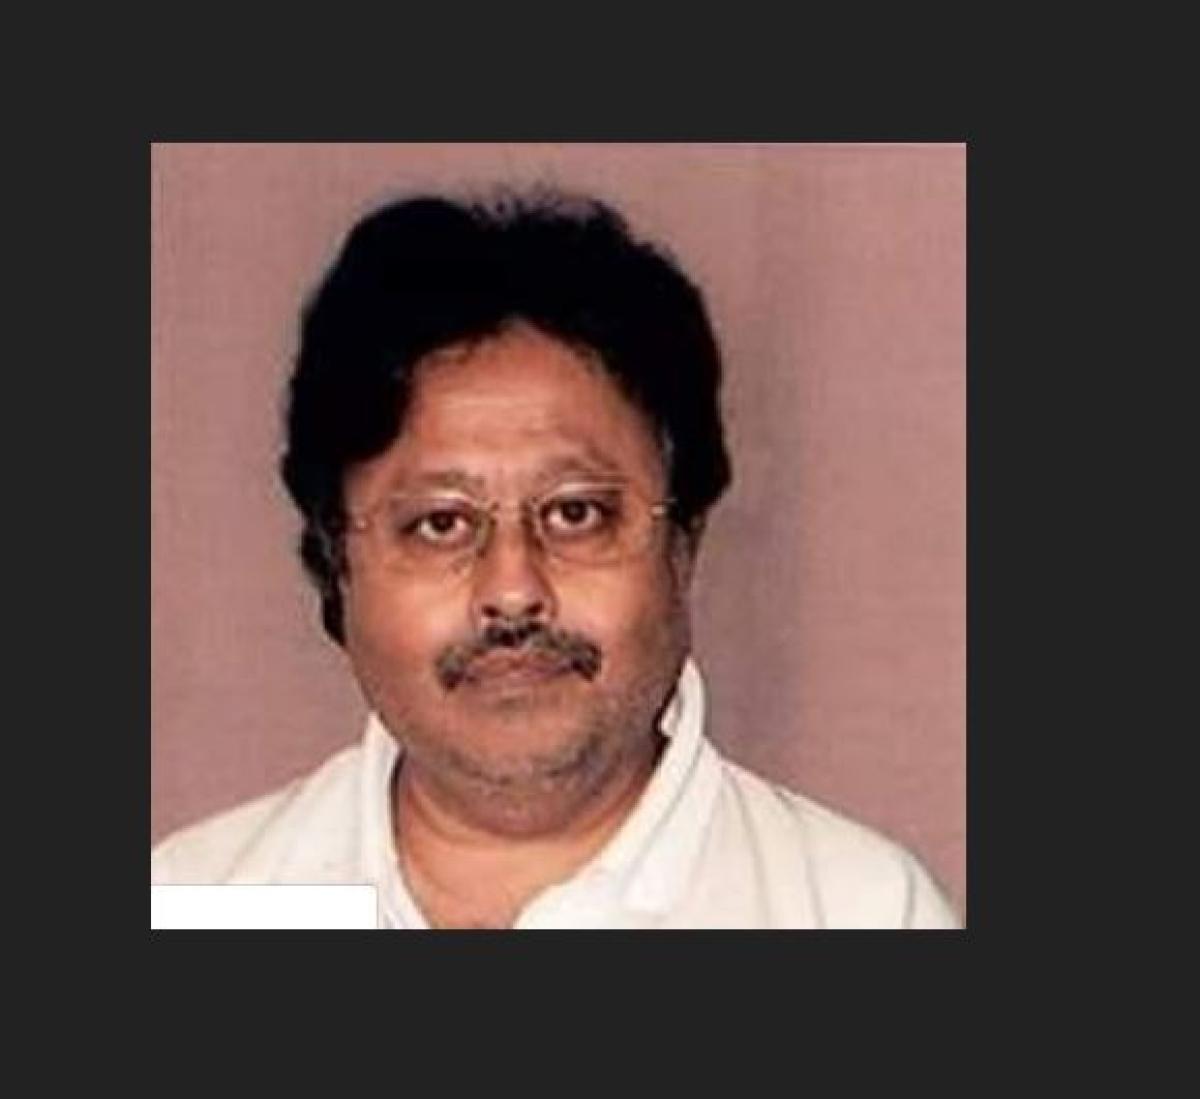 Kolkata based journalist Samir Goswami passed away on Sunday due to cardiac arrest. He was 65.